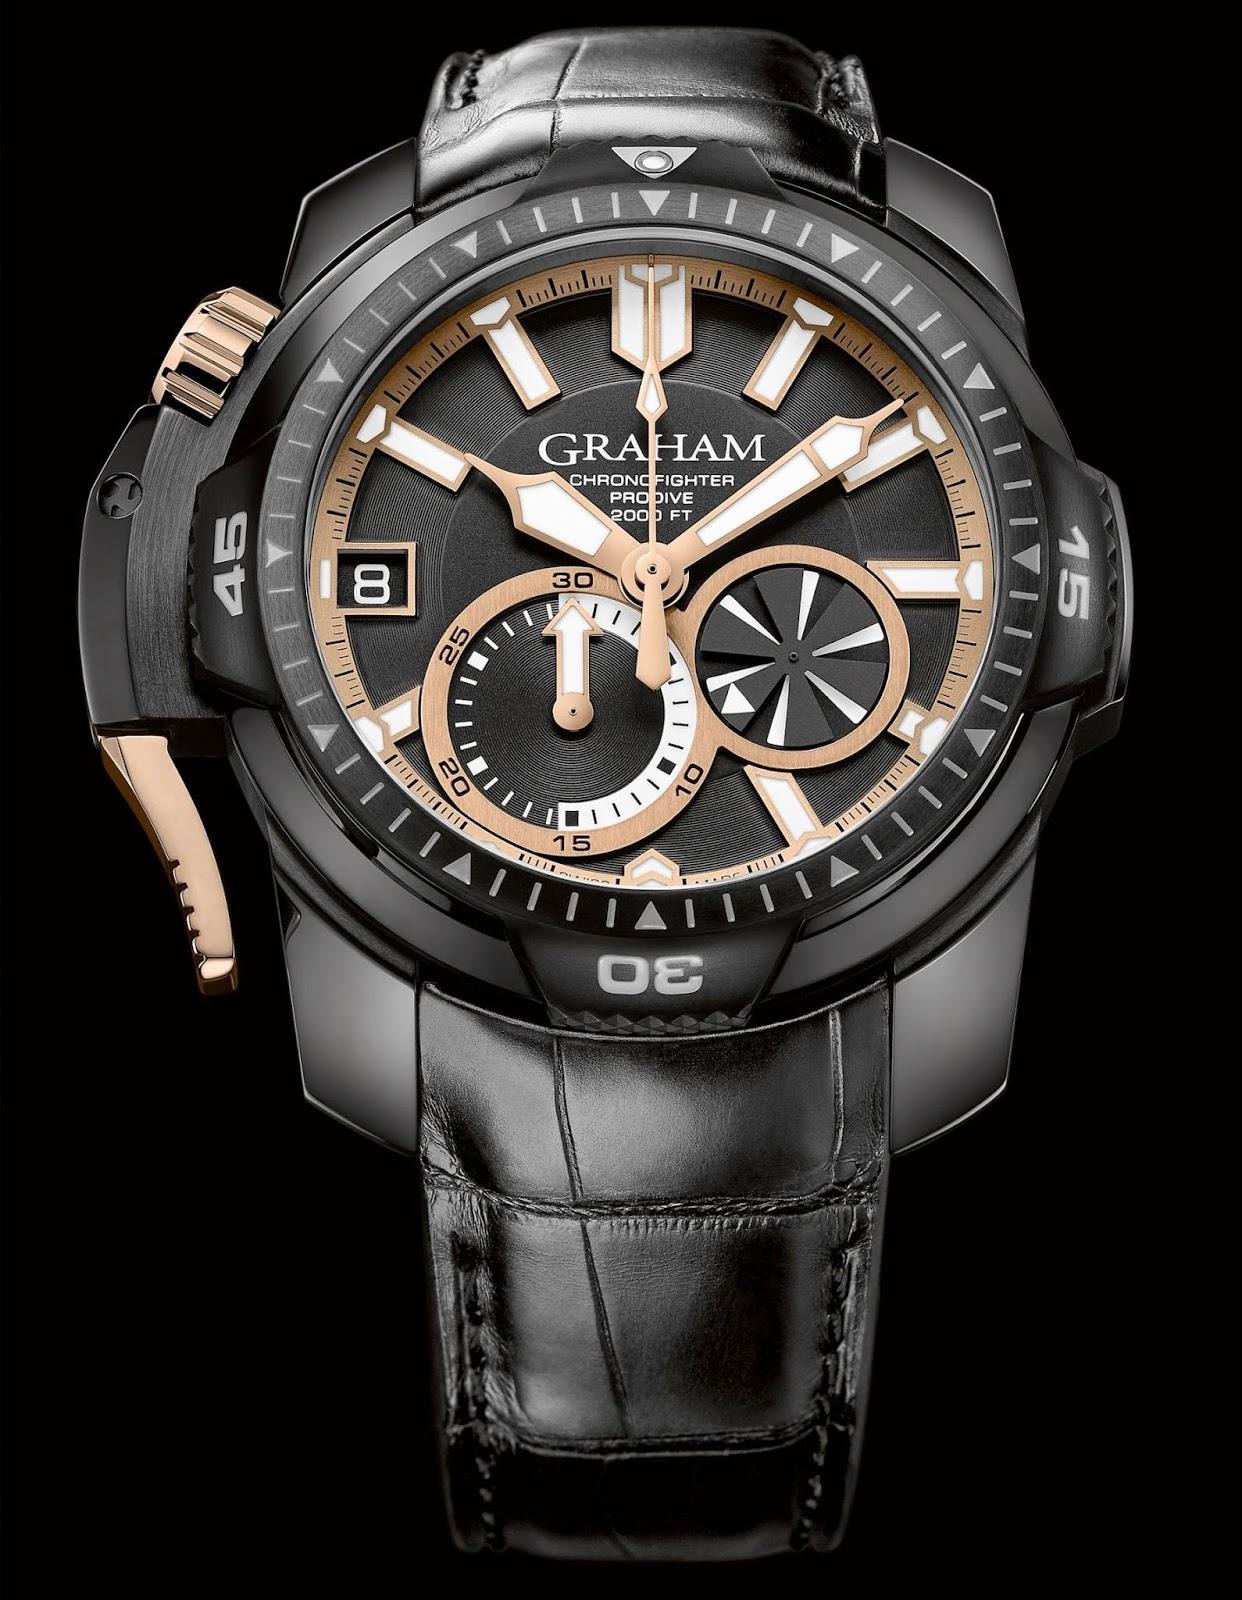 GRAHAM Prodive Limited Edition